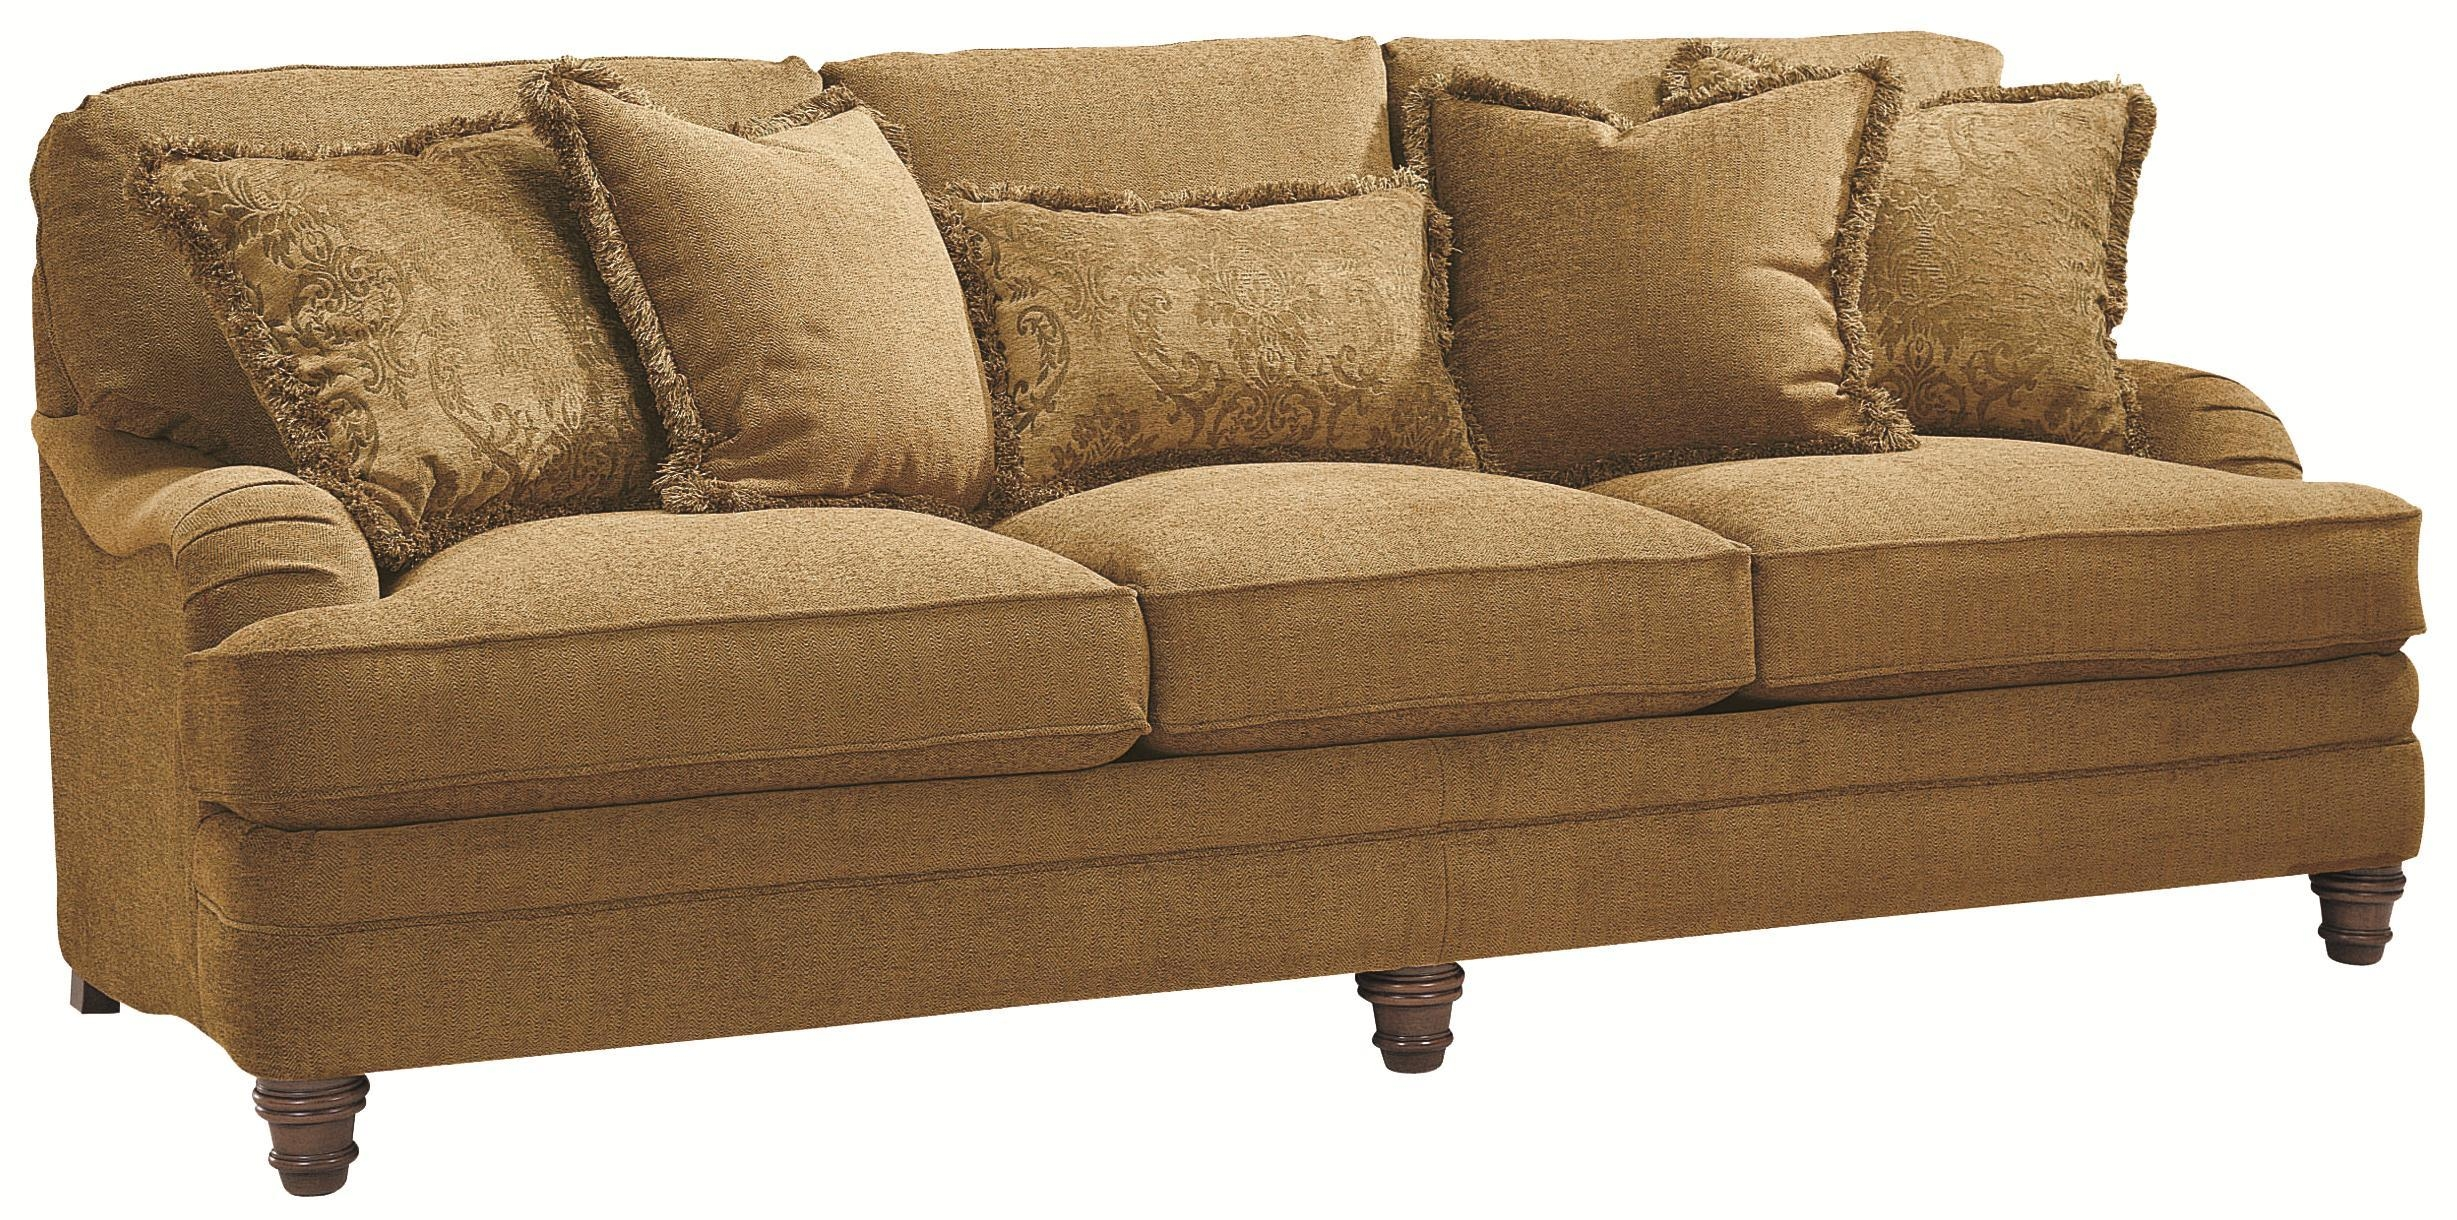 Bernhardt Tarleton Traditional Styled Stationary Sofa In Slightly Intended For Bernhardt Tarleton Sofas (Image 11 of 20)